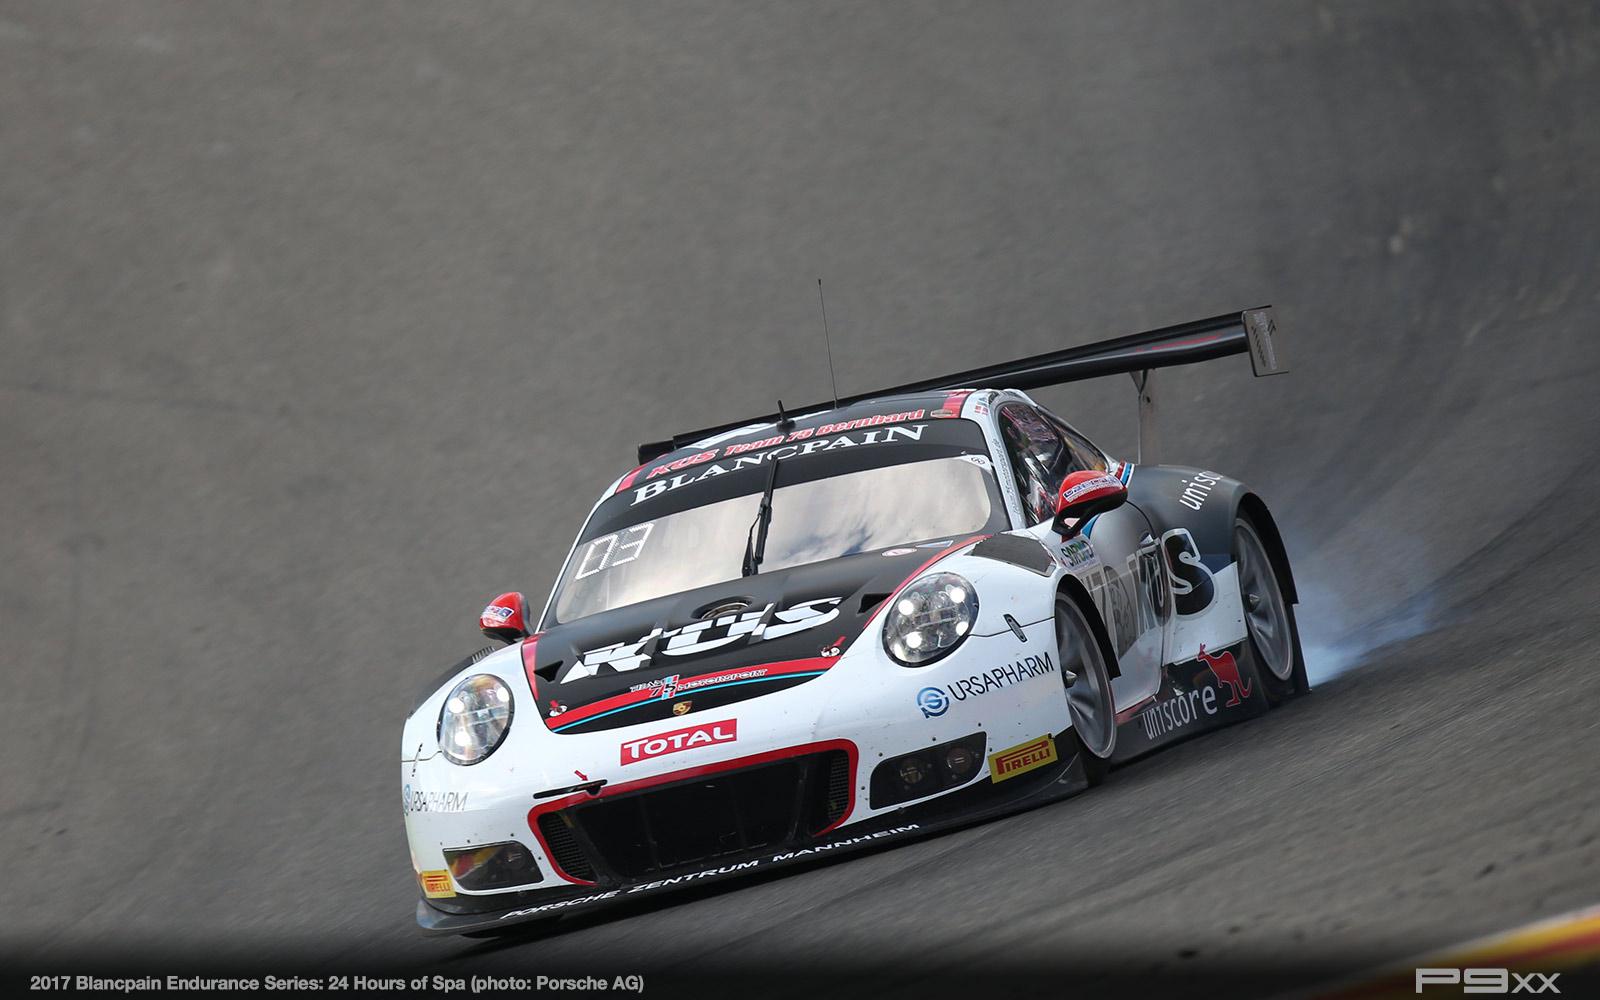 2017-24-Hours-of-Spa-Porsche-349